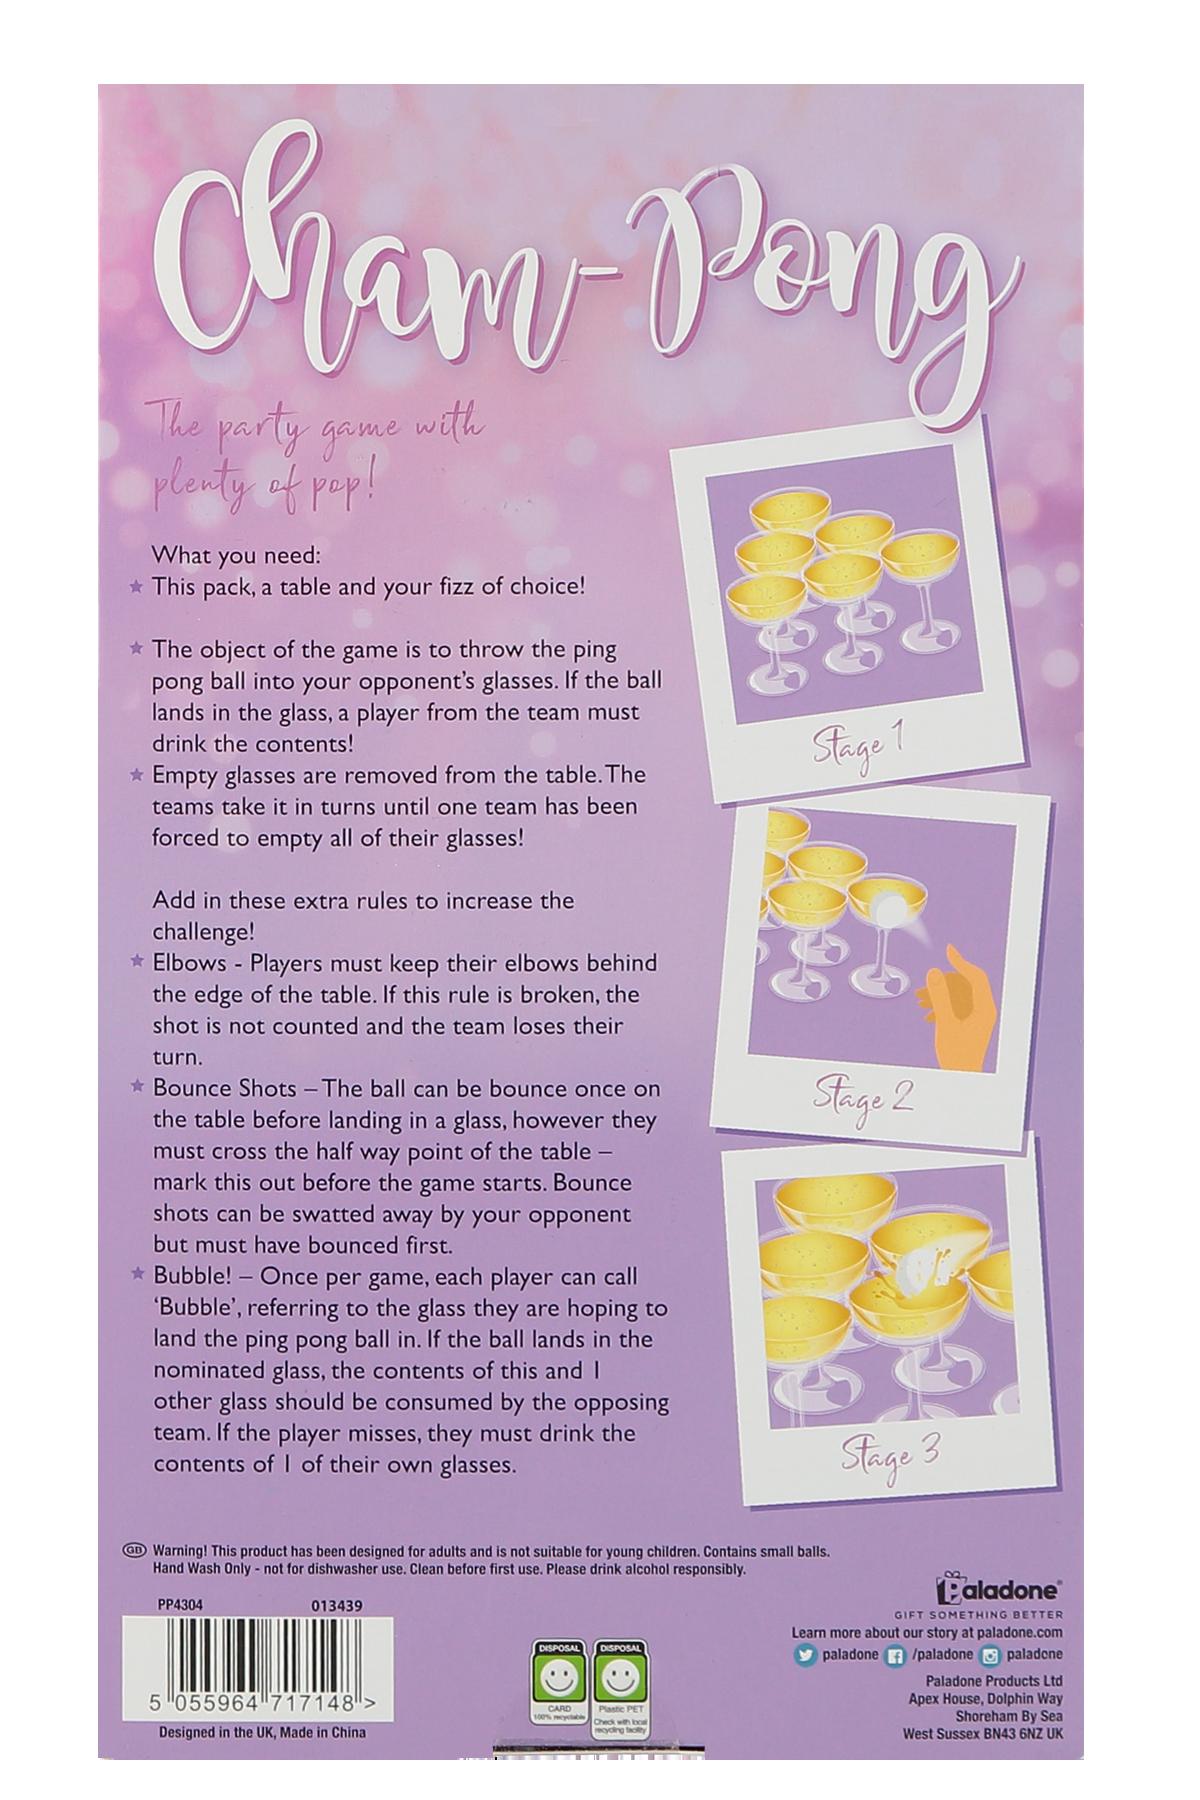 Gift Cham-pong